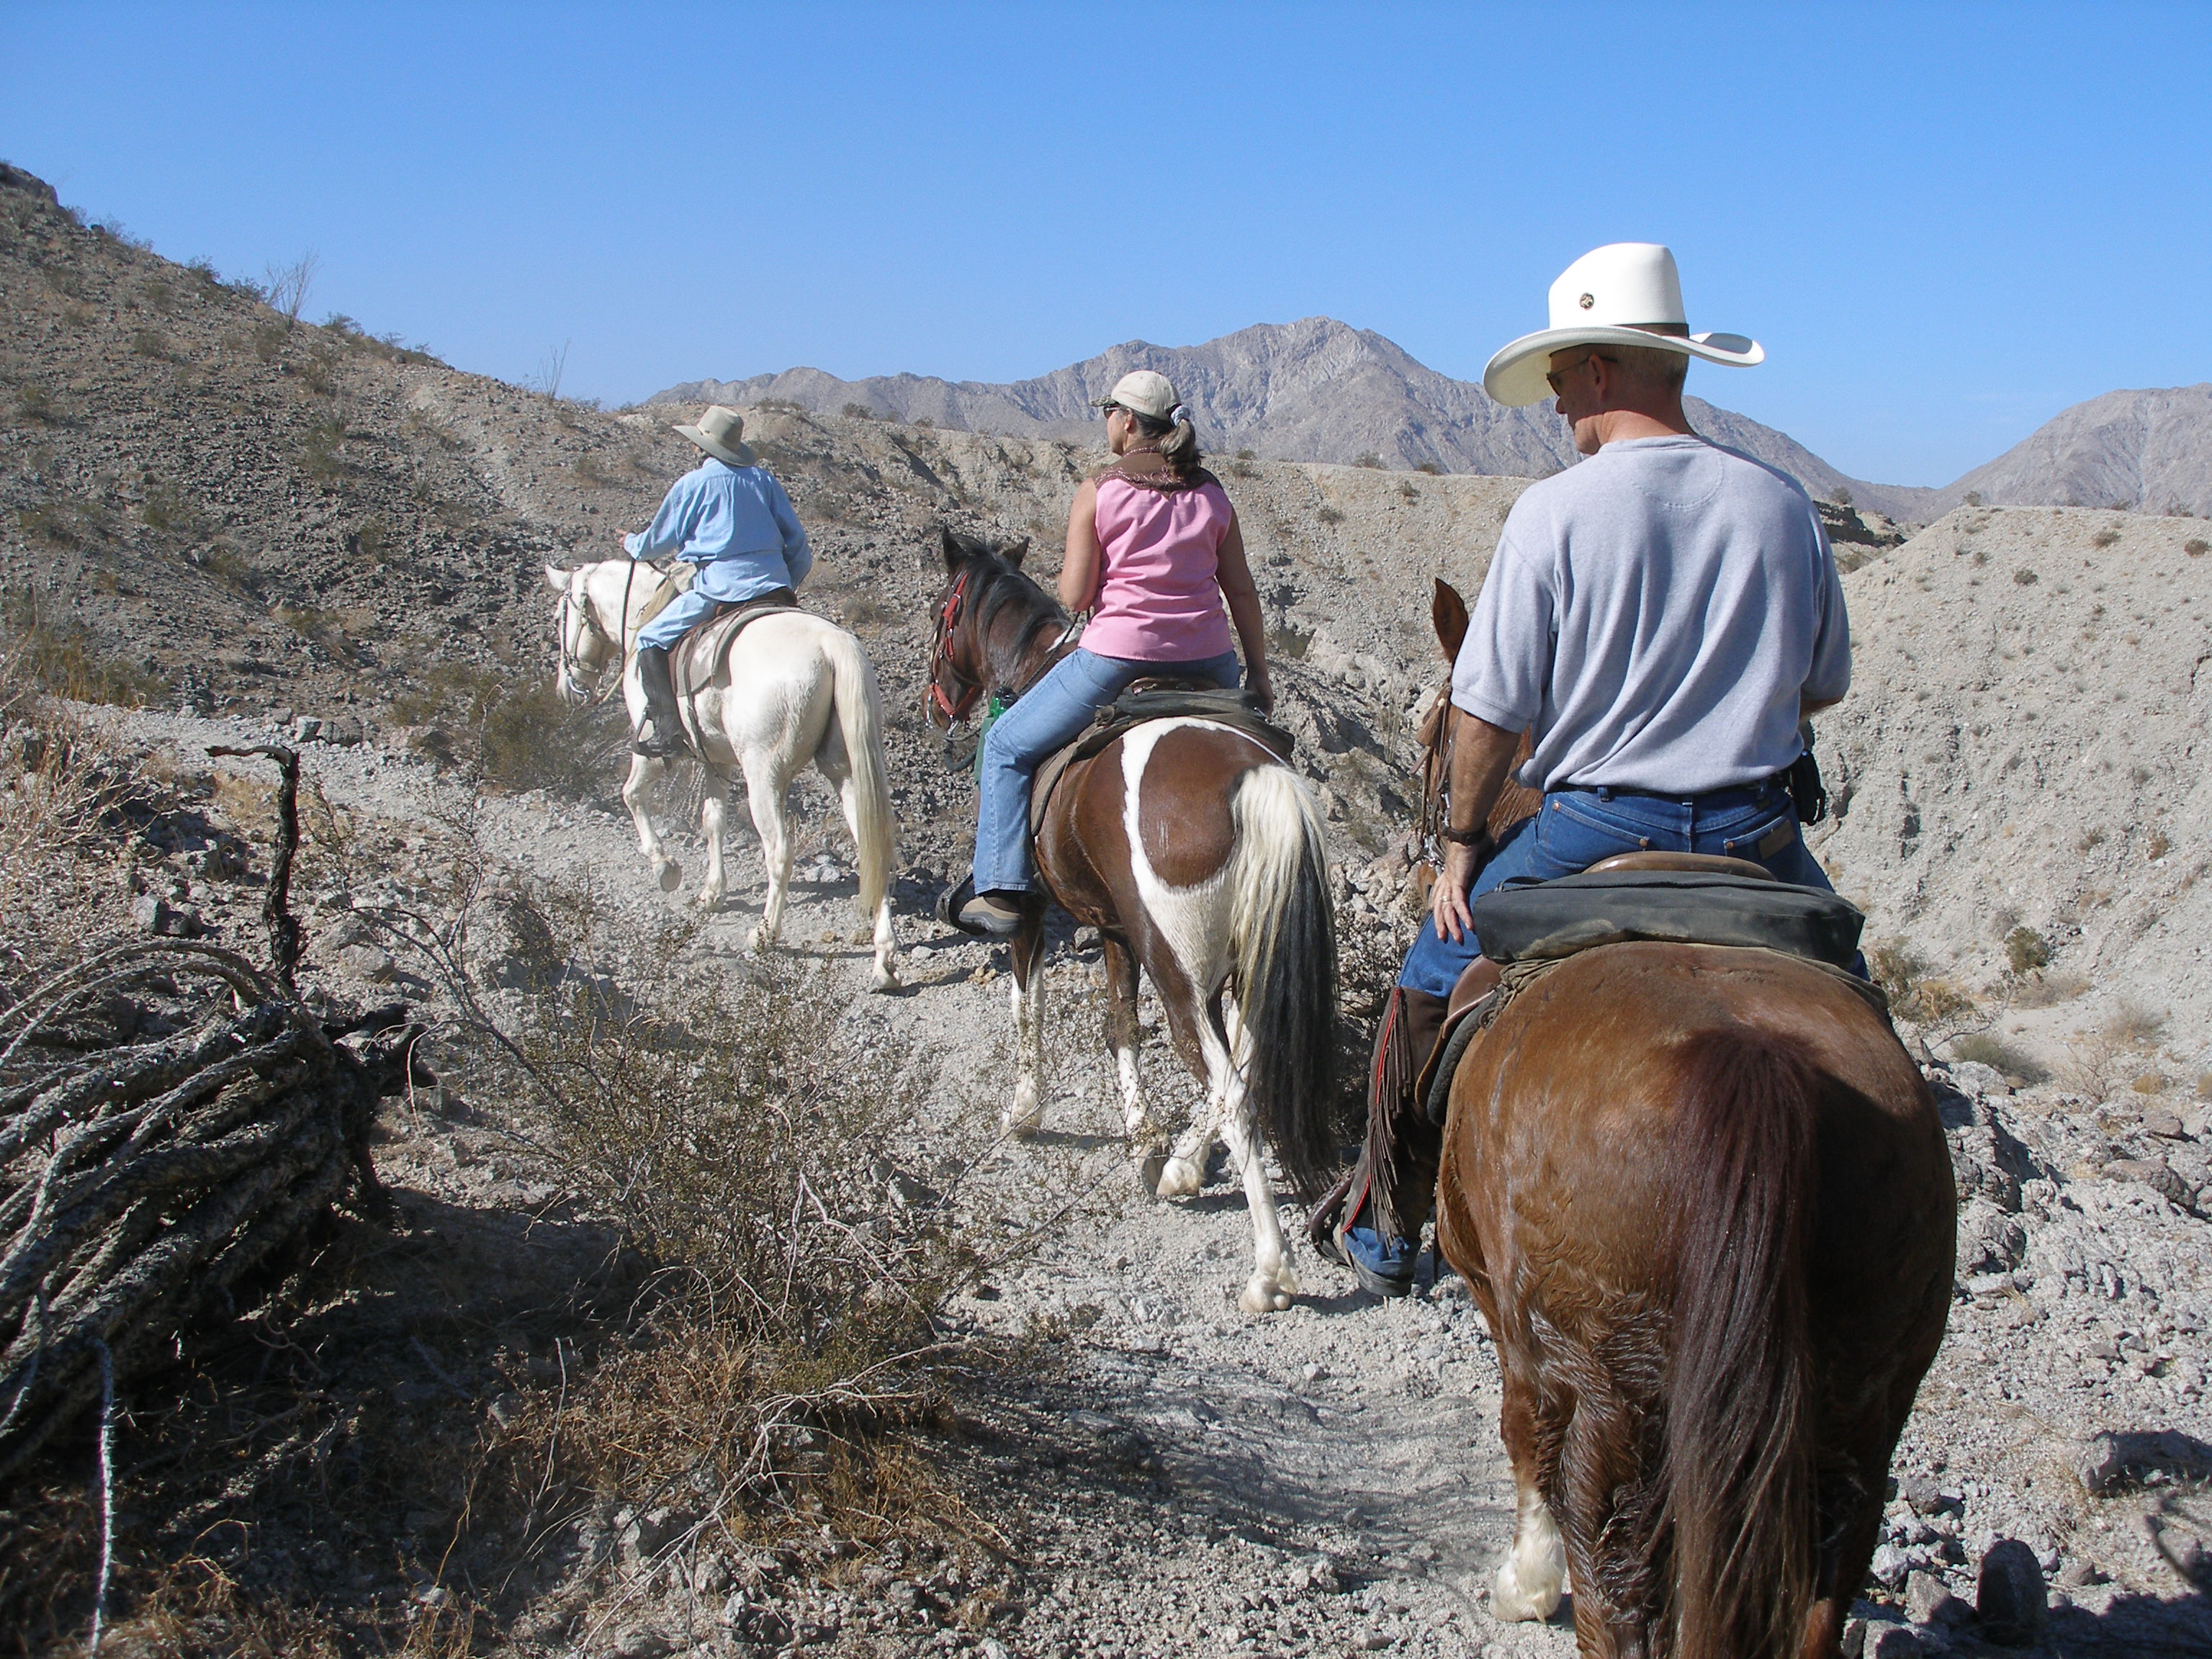 Horseback riders at Cahuilla